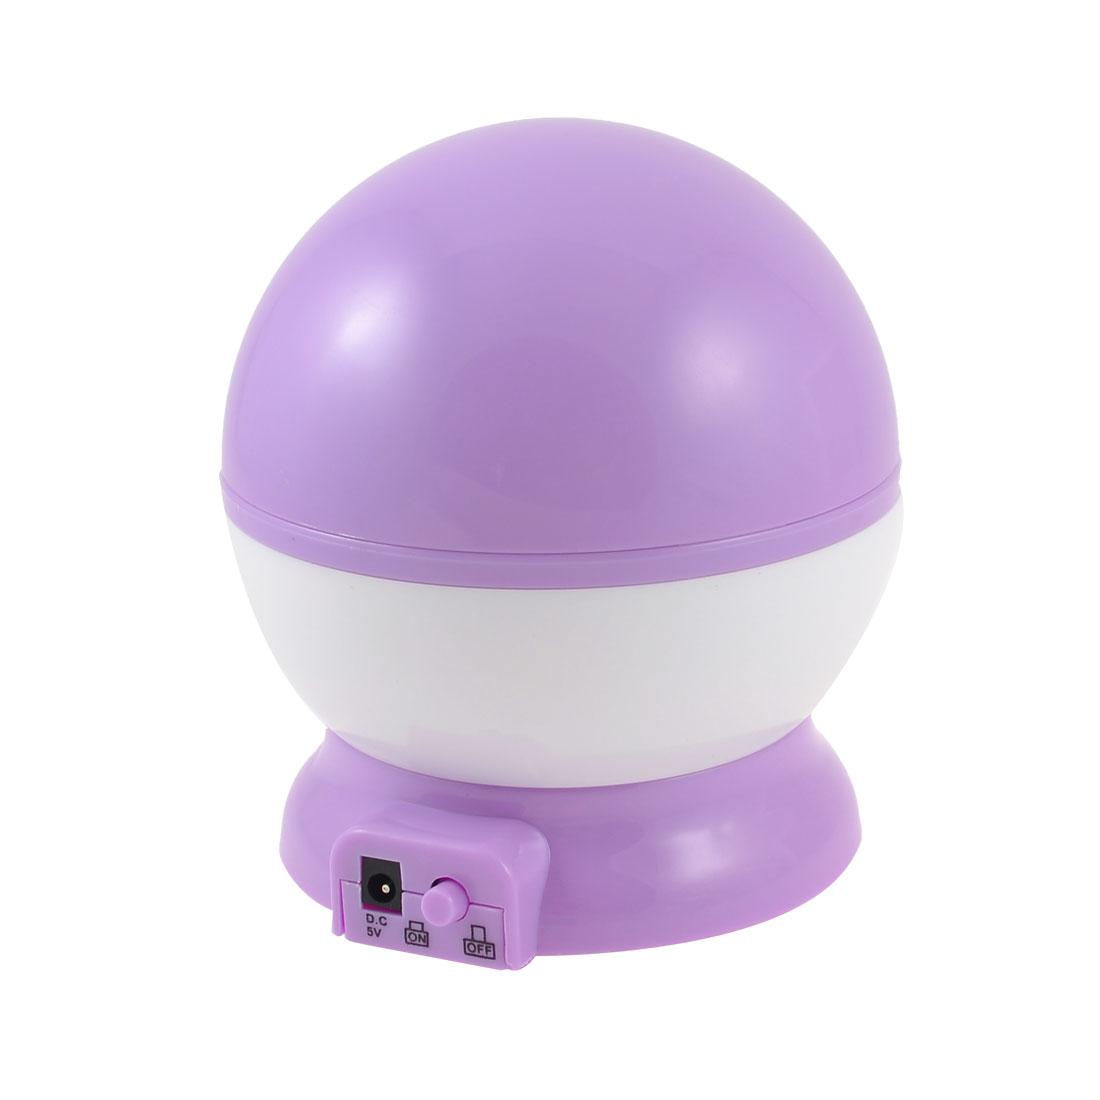 USB Cable Christmas Gift Star Moon Print Night Light Projector Lamp Blue Purple